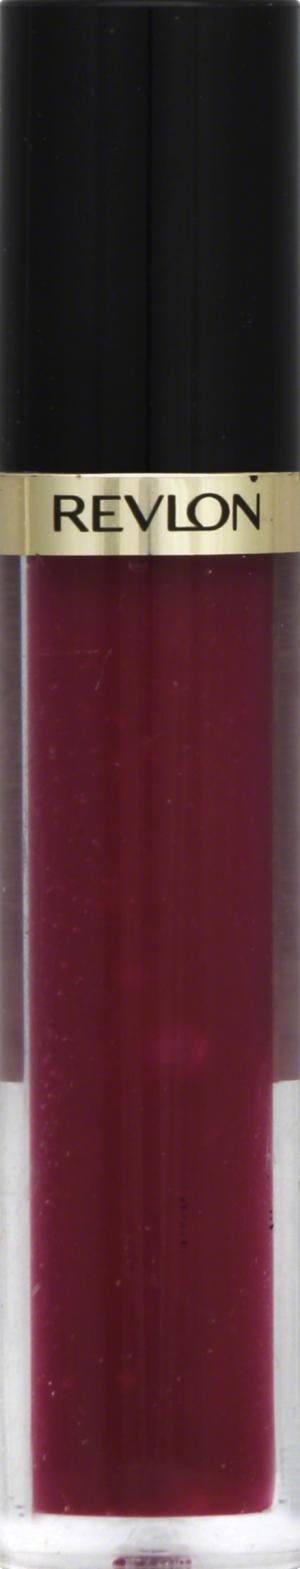 Revlon Super Lustrous Lip Gloss - Berry Allure